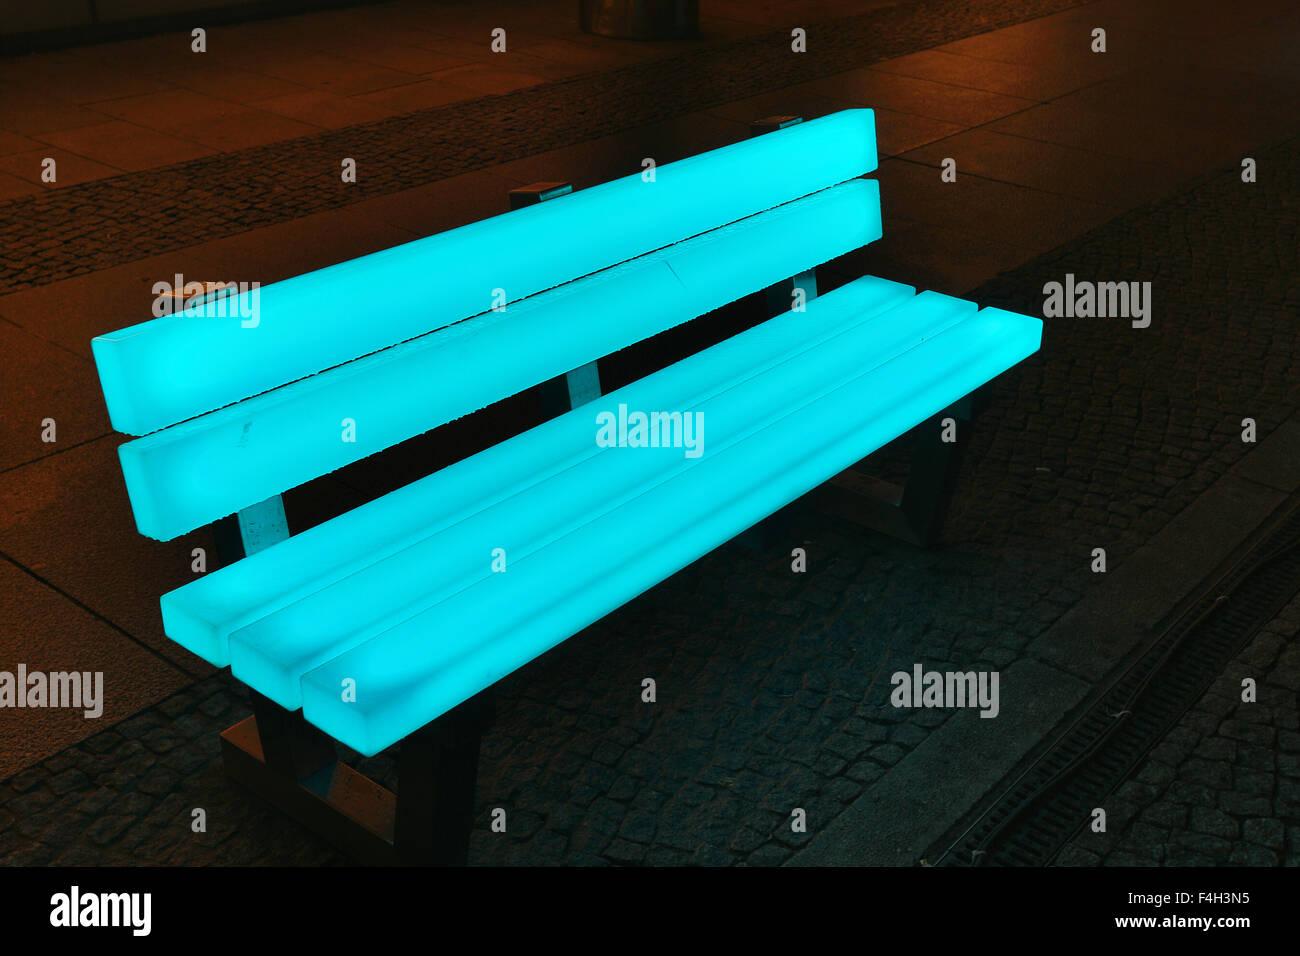 Led Light Bench : Berlin festival of lights led bench stock photo royalty